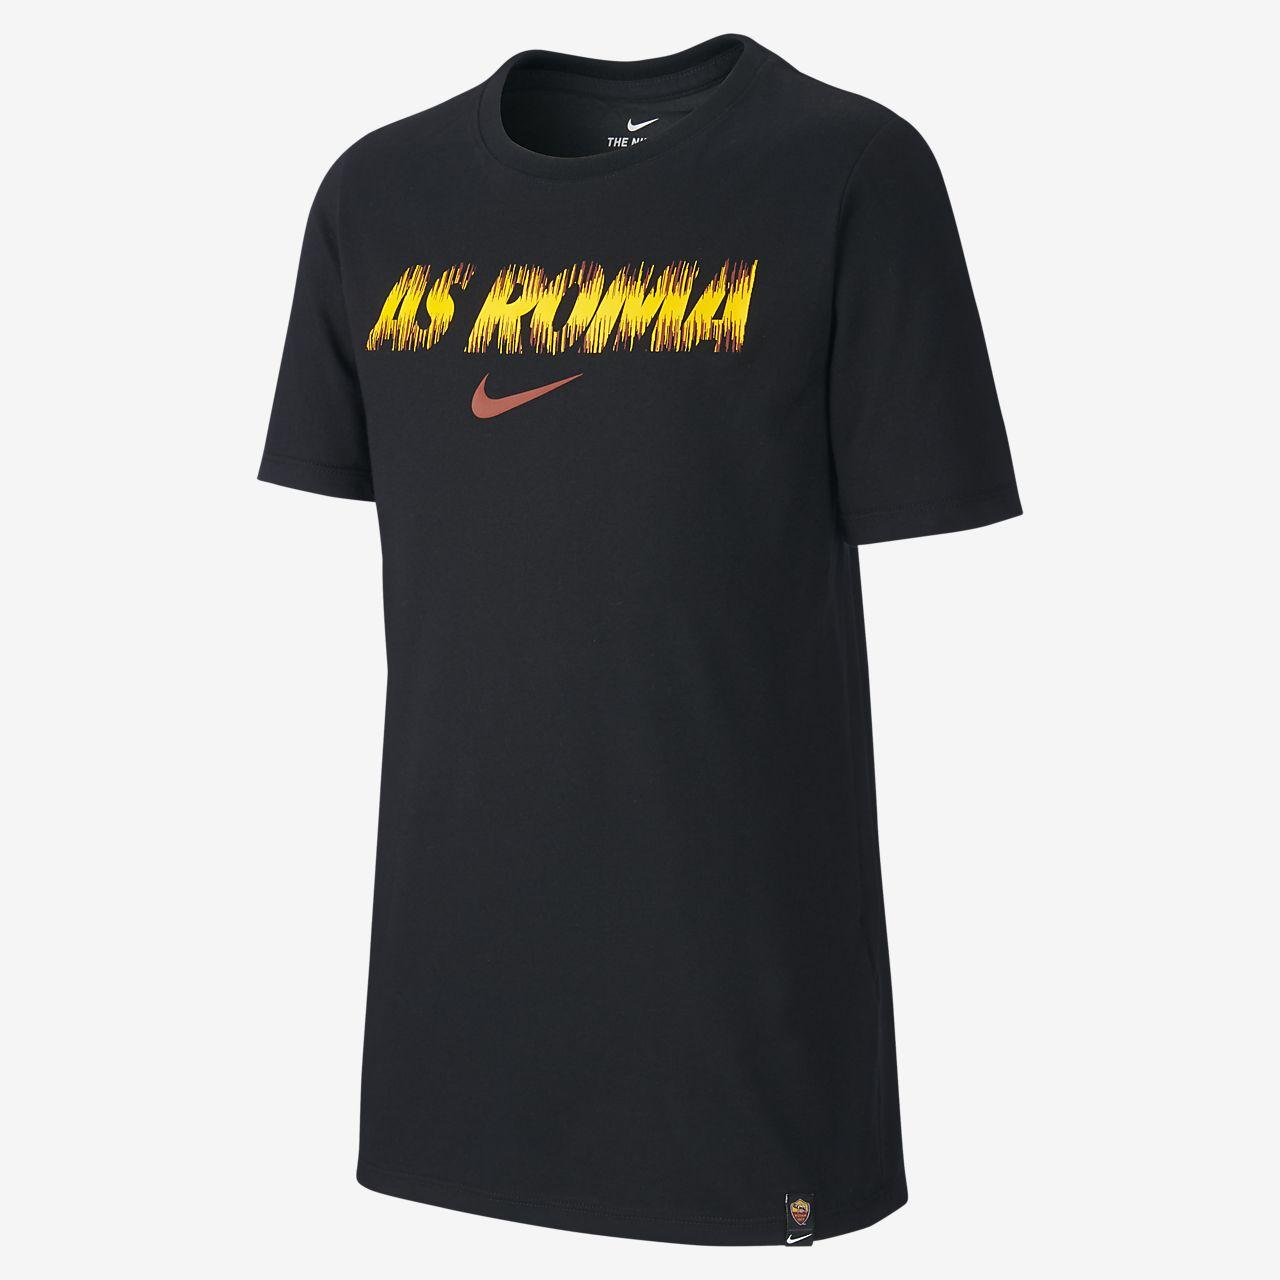 Nike Dri-FIT A.S. Roma fotball-t-skjorte til store barn